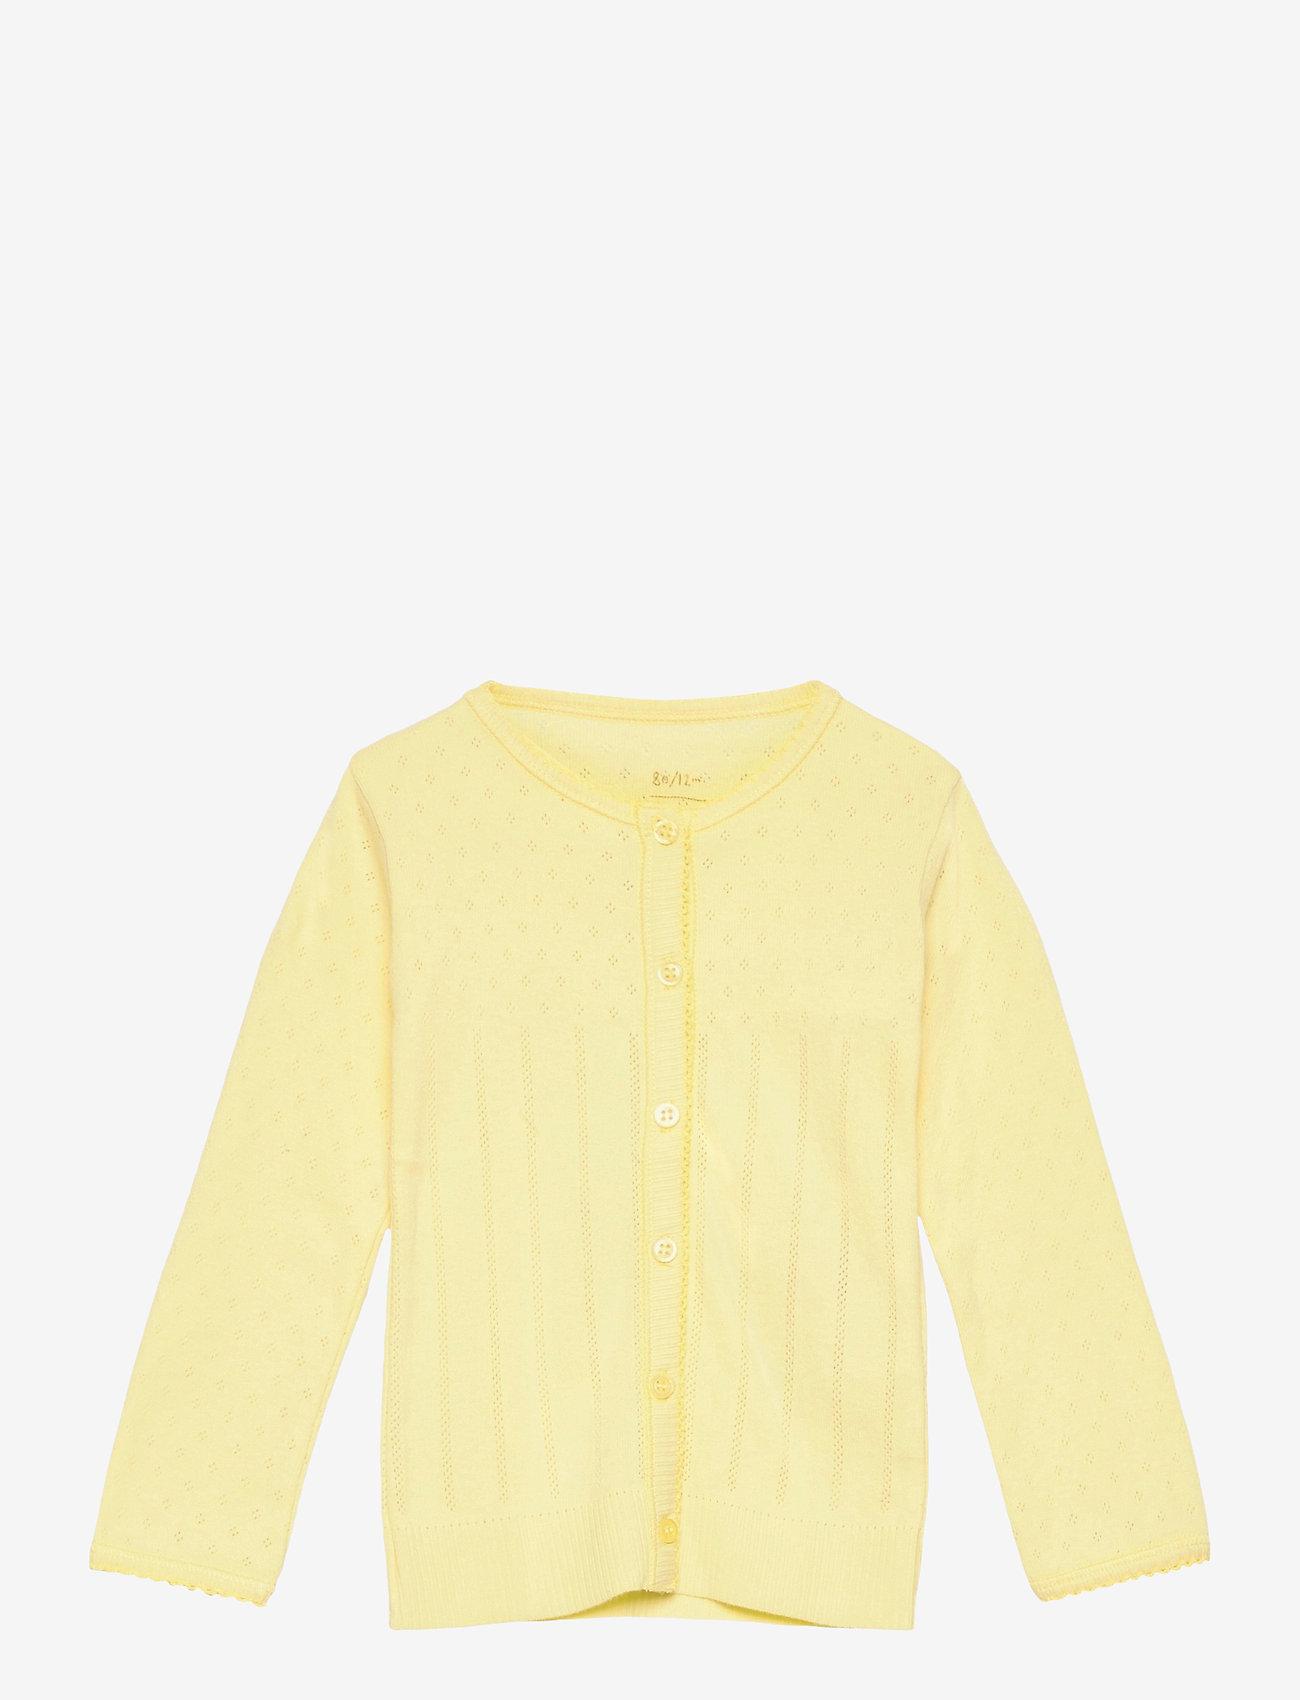 Noa Noa Miniature - Cardigan - gilets - lemon grass - 0